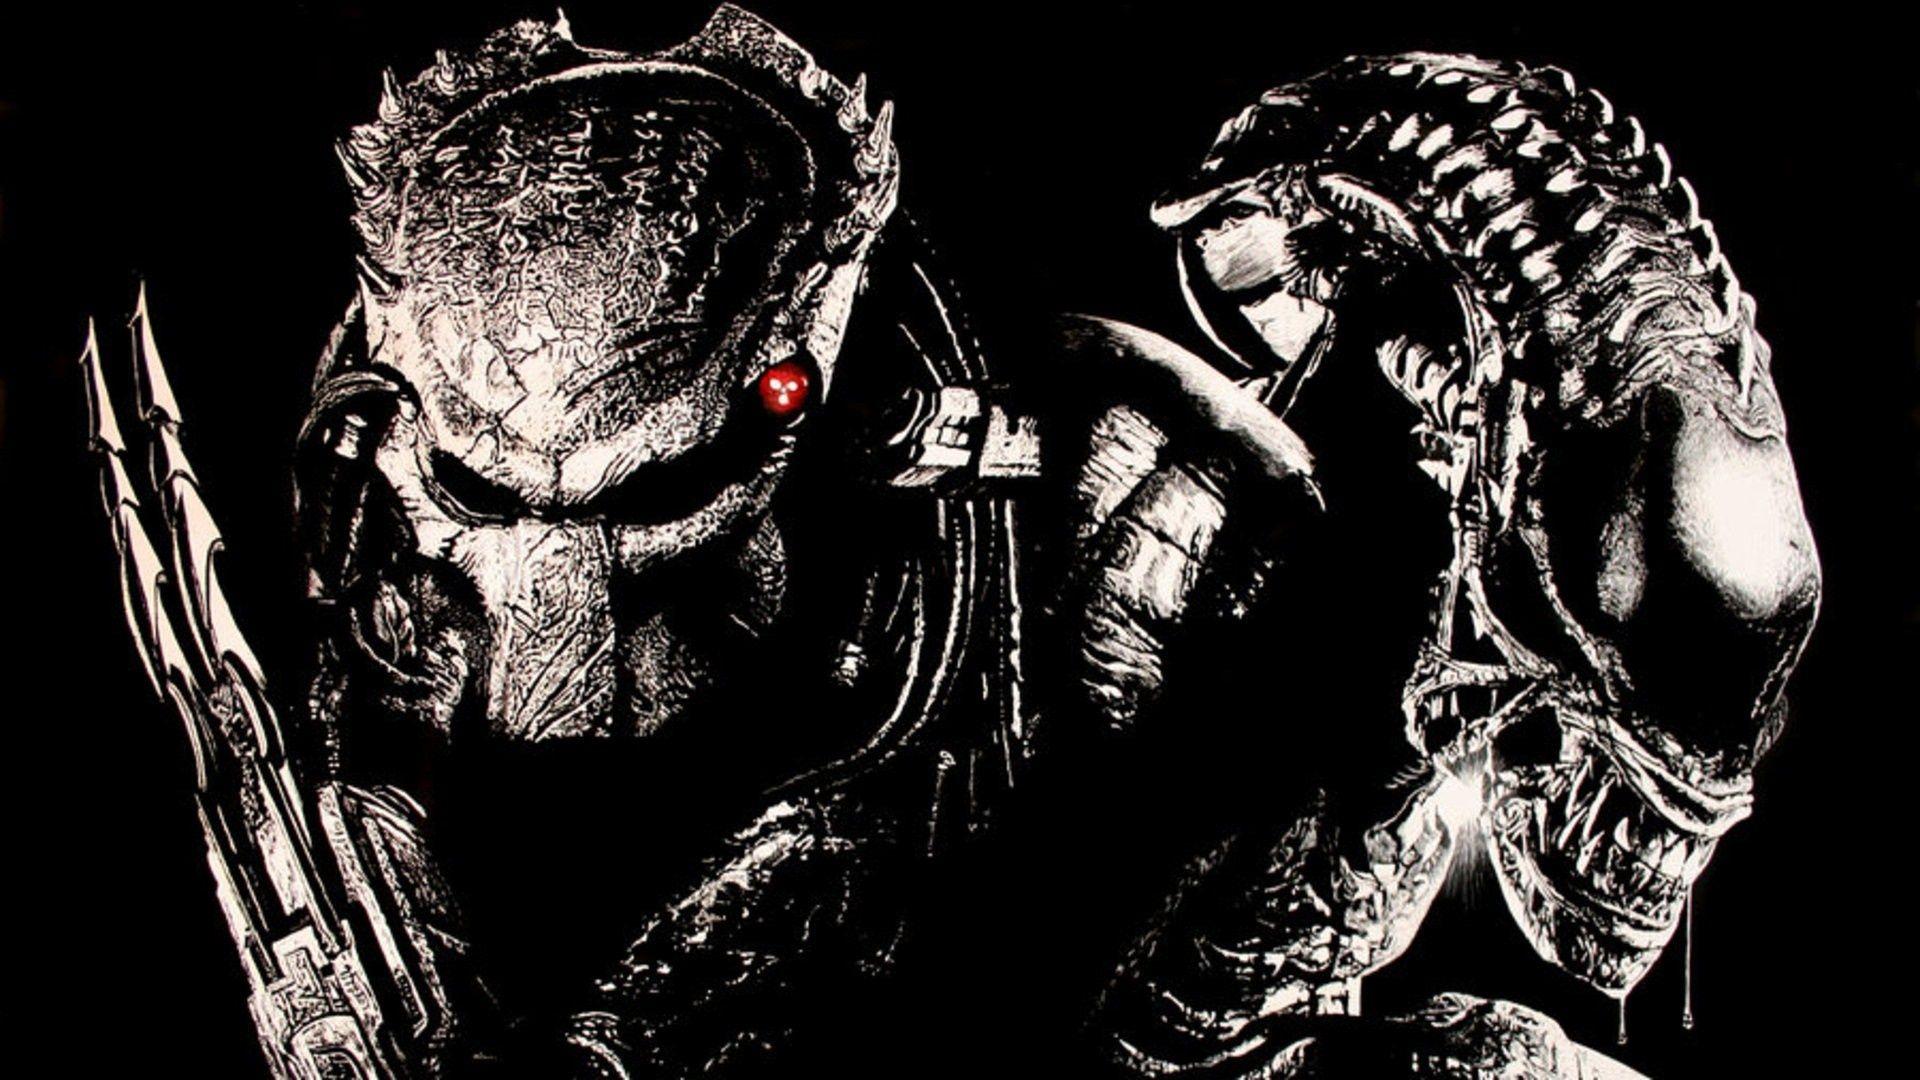 Alien Vs Predator Wallpaper 5